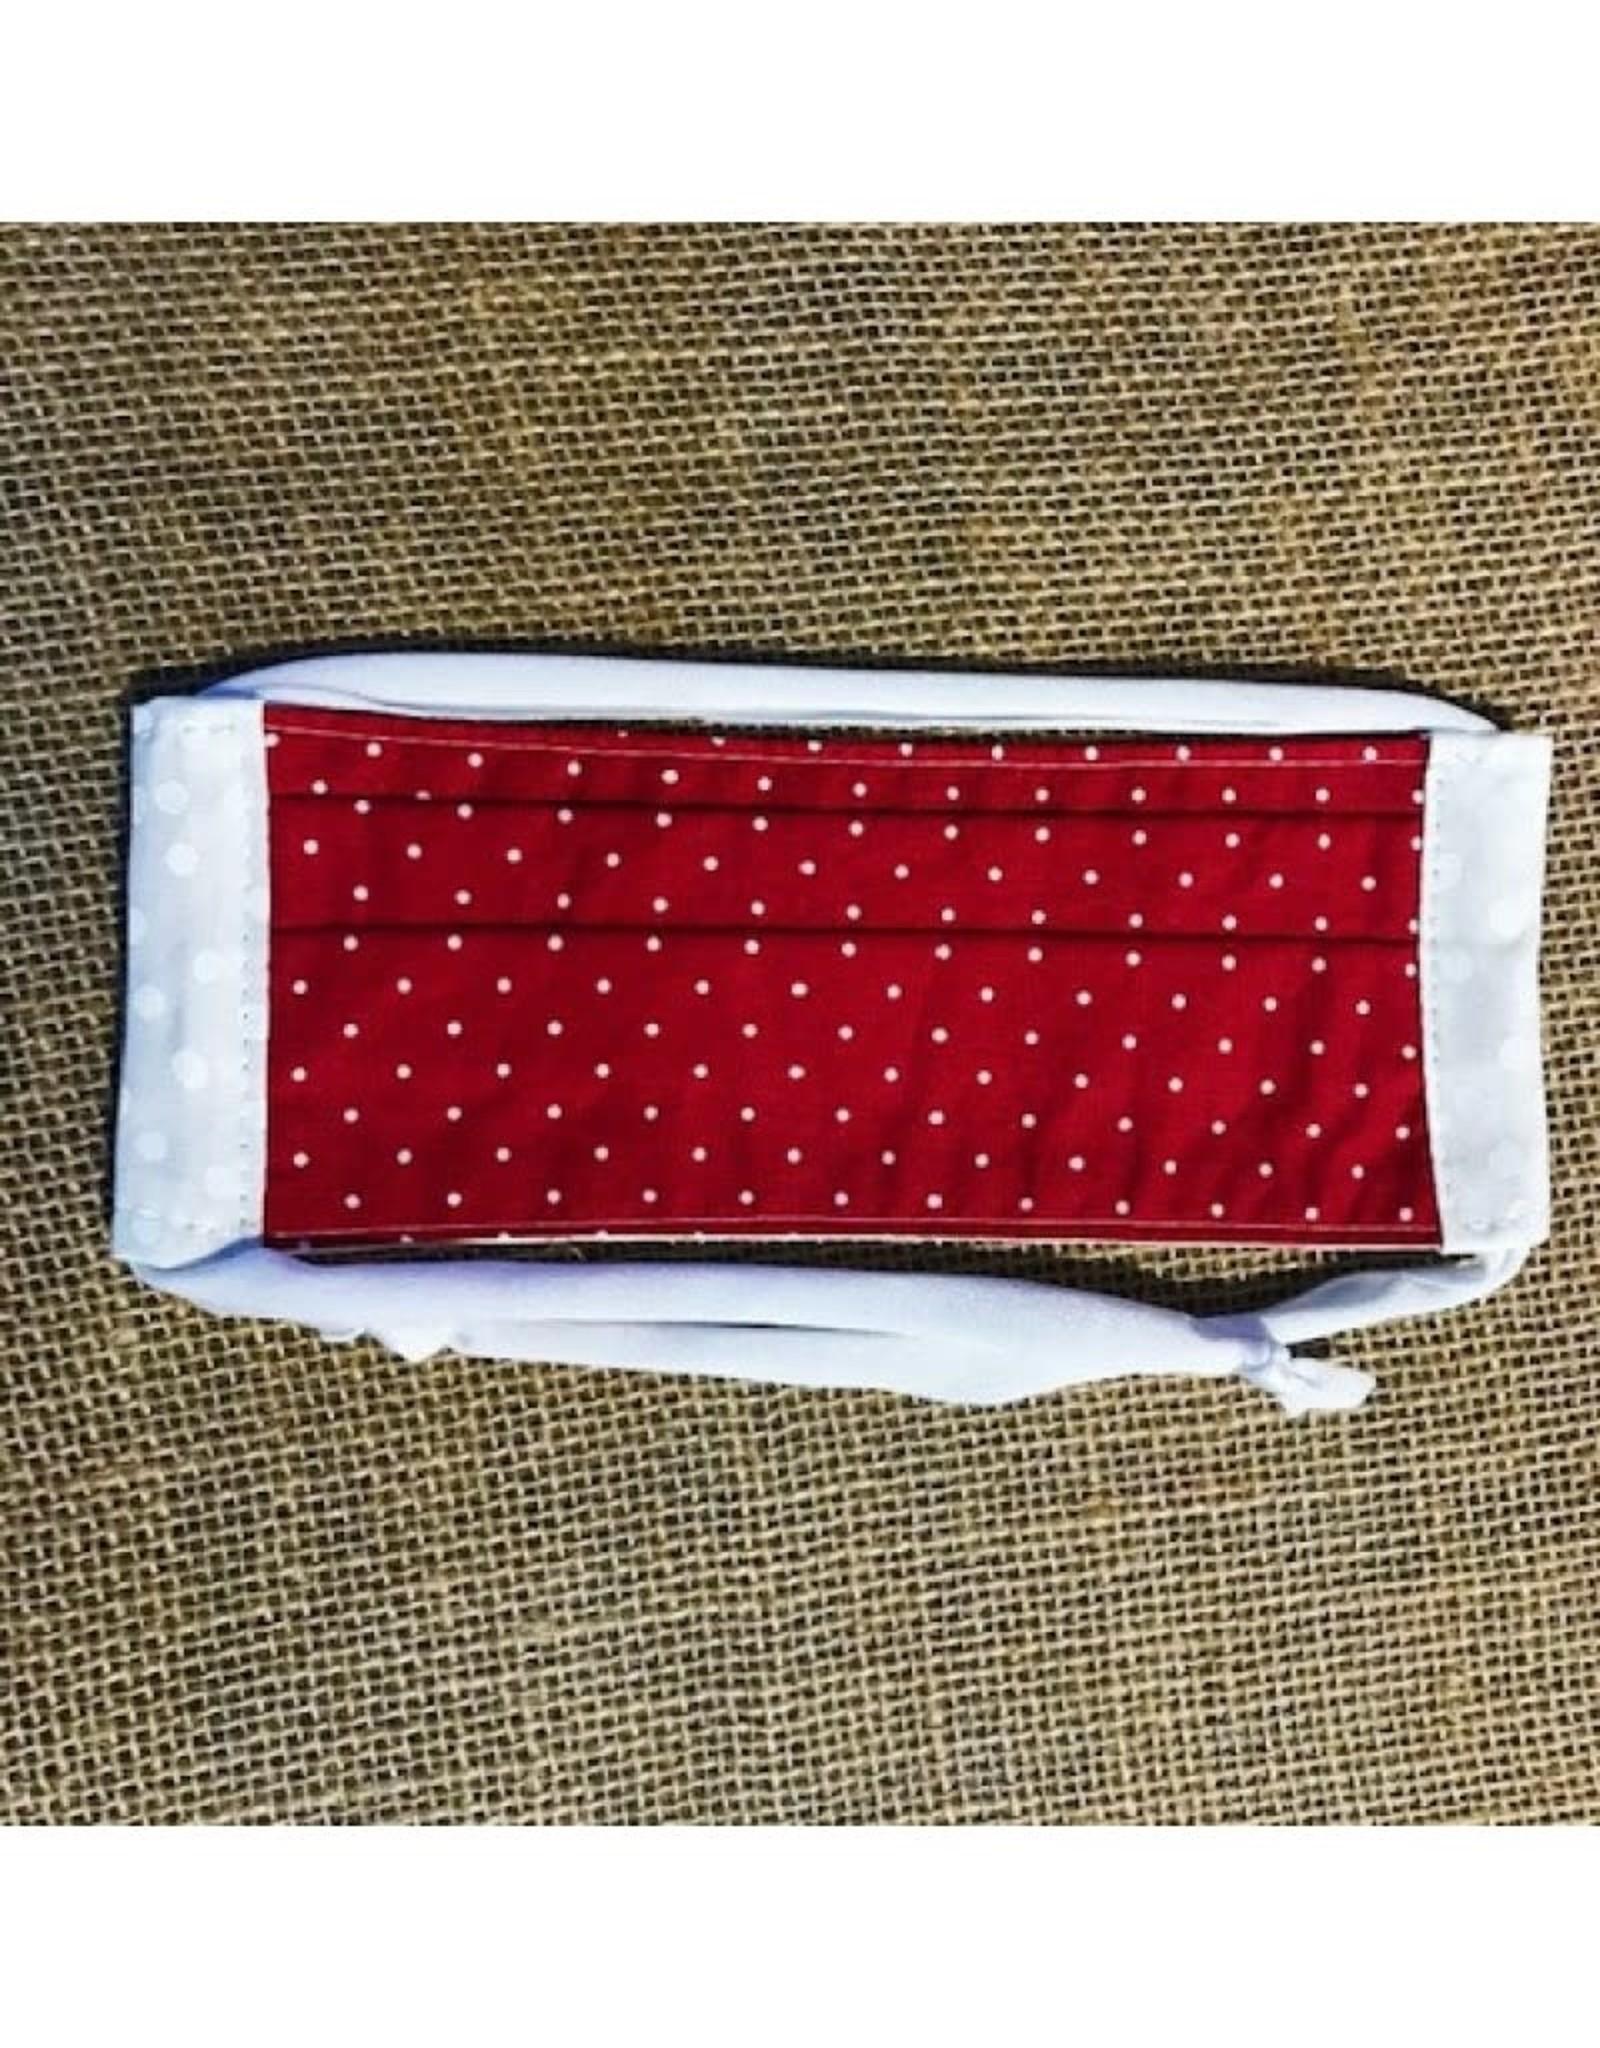 Bear Den Handmade Cotton Mask - Red Polka Dot